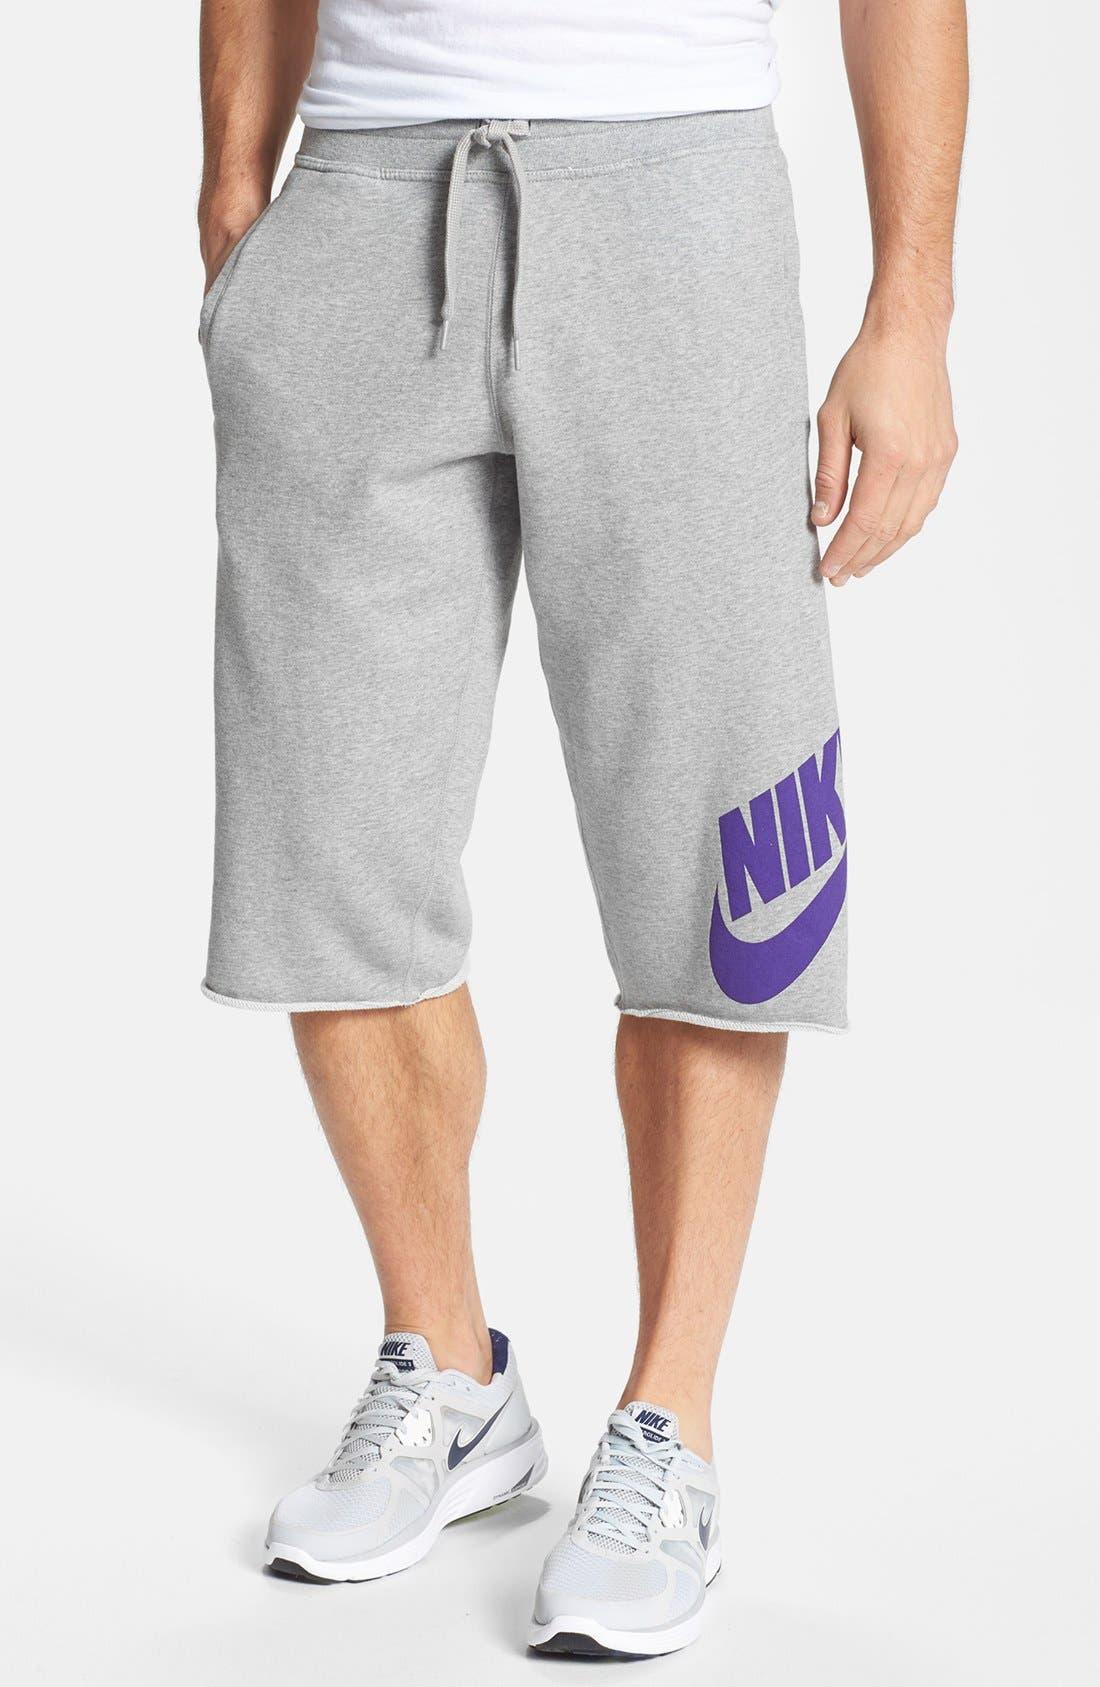 Alternate Image 1 Selected - Nike 'Heritage Pick-Up Game' Basketball Shorts